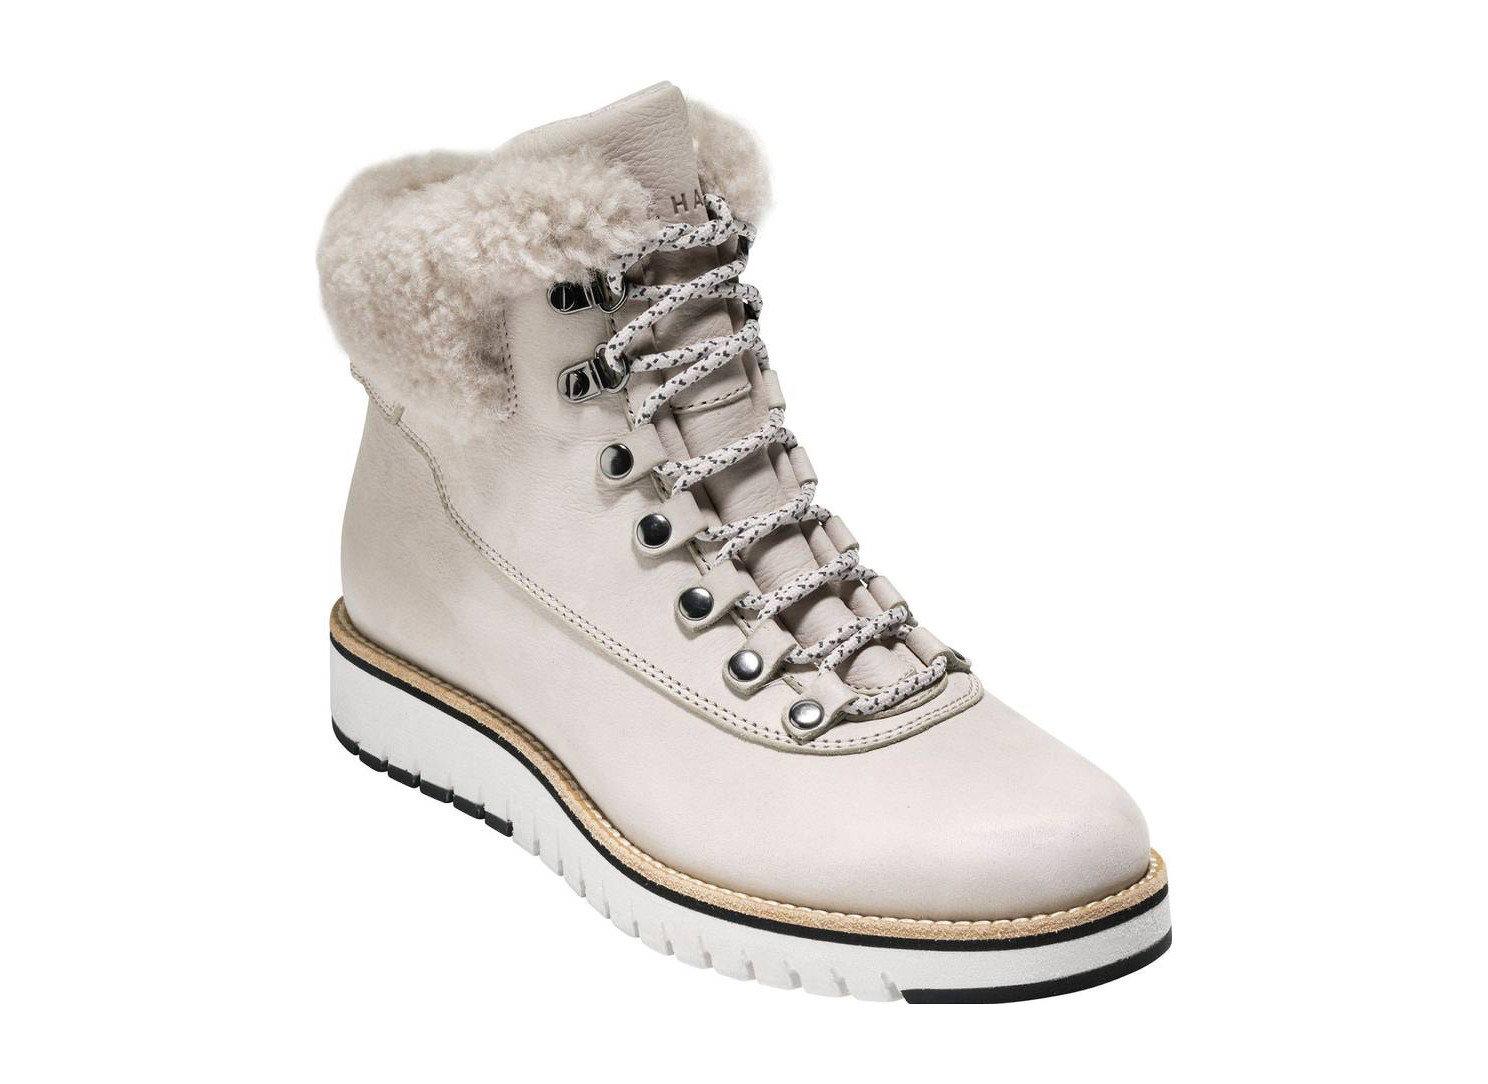 Style + Design Travel Shop clothing footwear white shoe boot beige walking shoe product work boots outdoor shoe sportswear snow boot product design sneakers cross training shoe